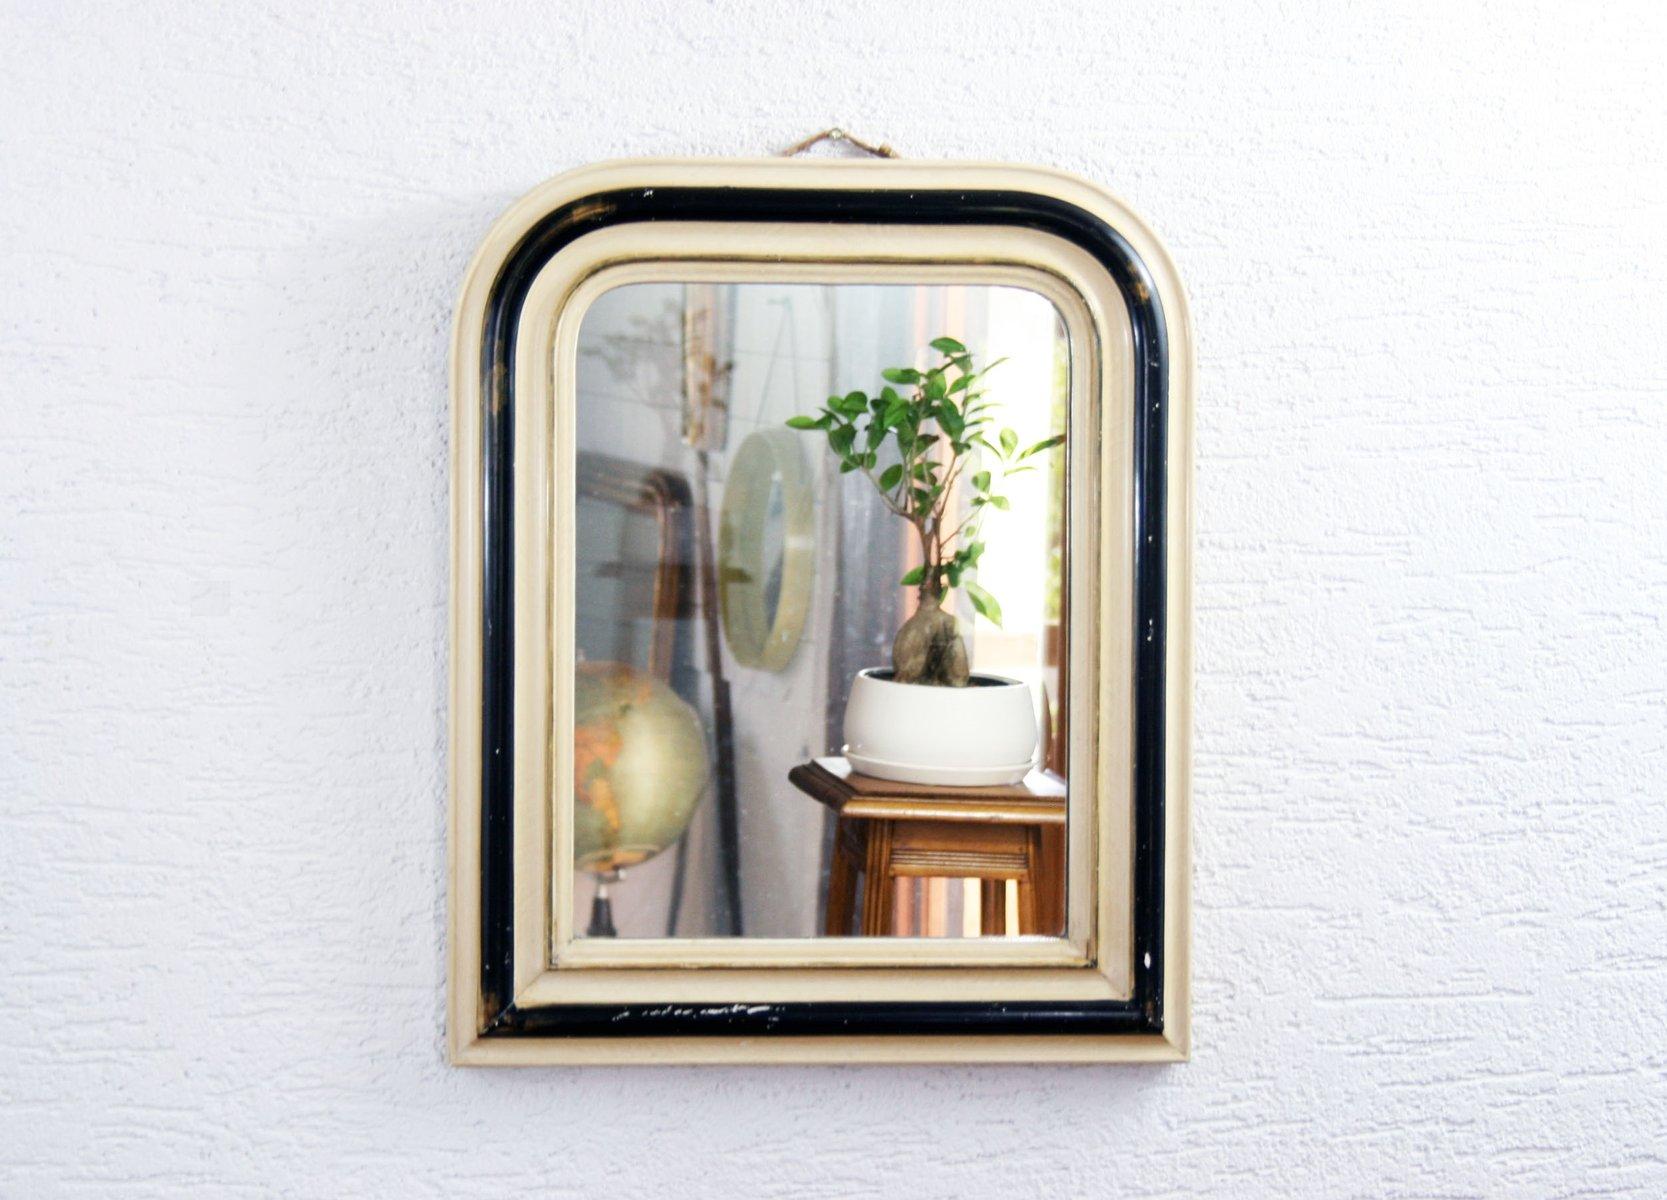 miroir napoleon iii 19 me si cle en vente sur pamono